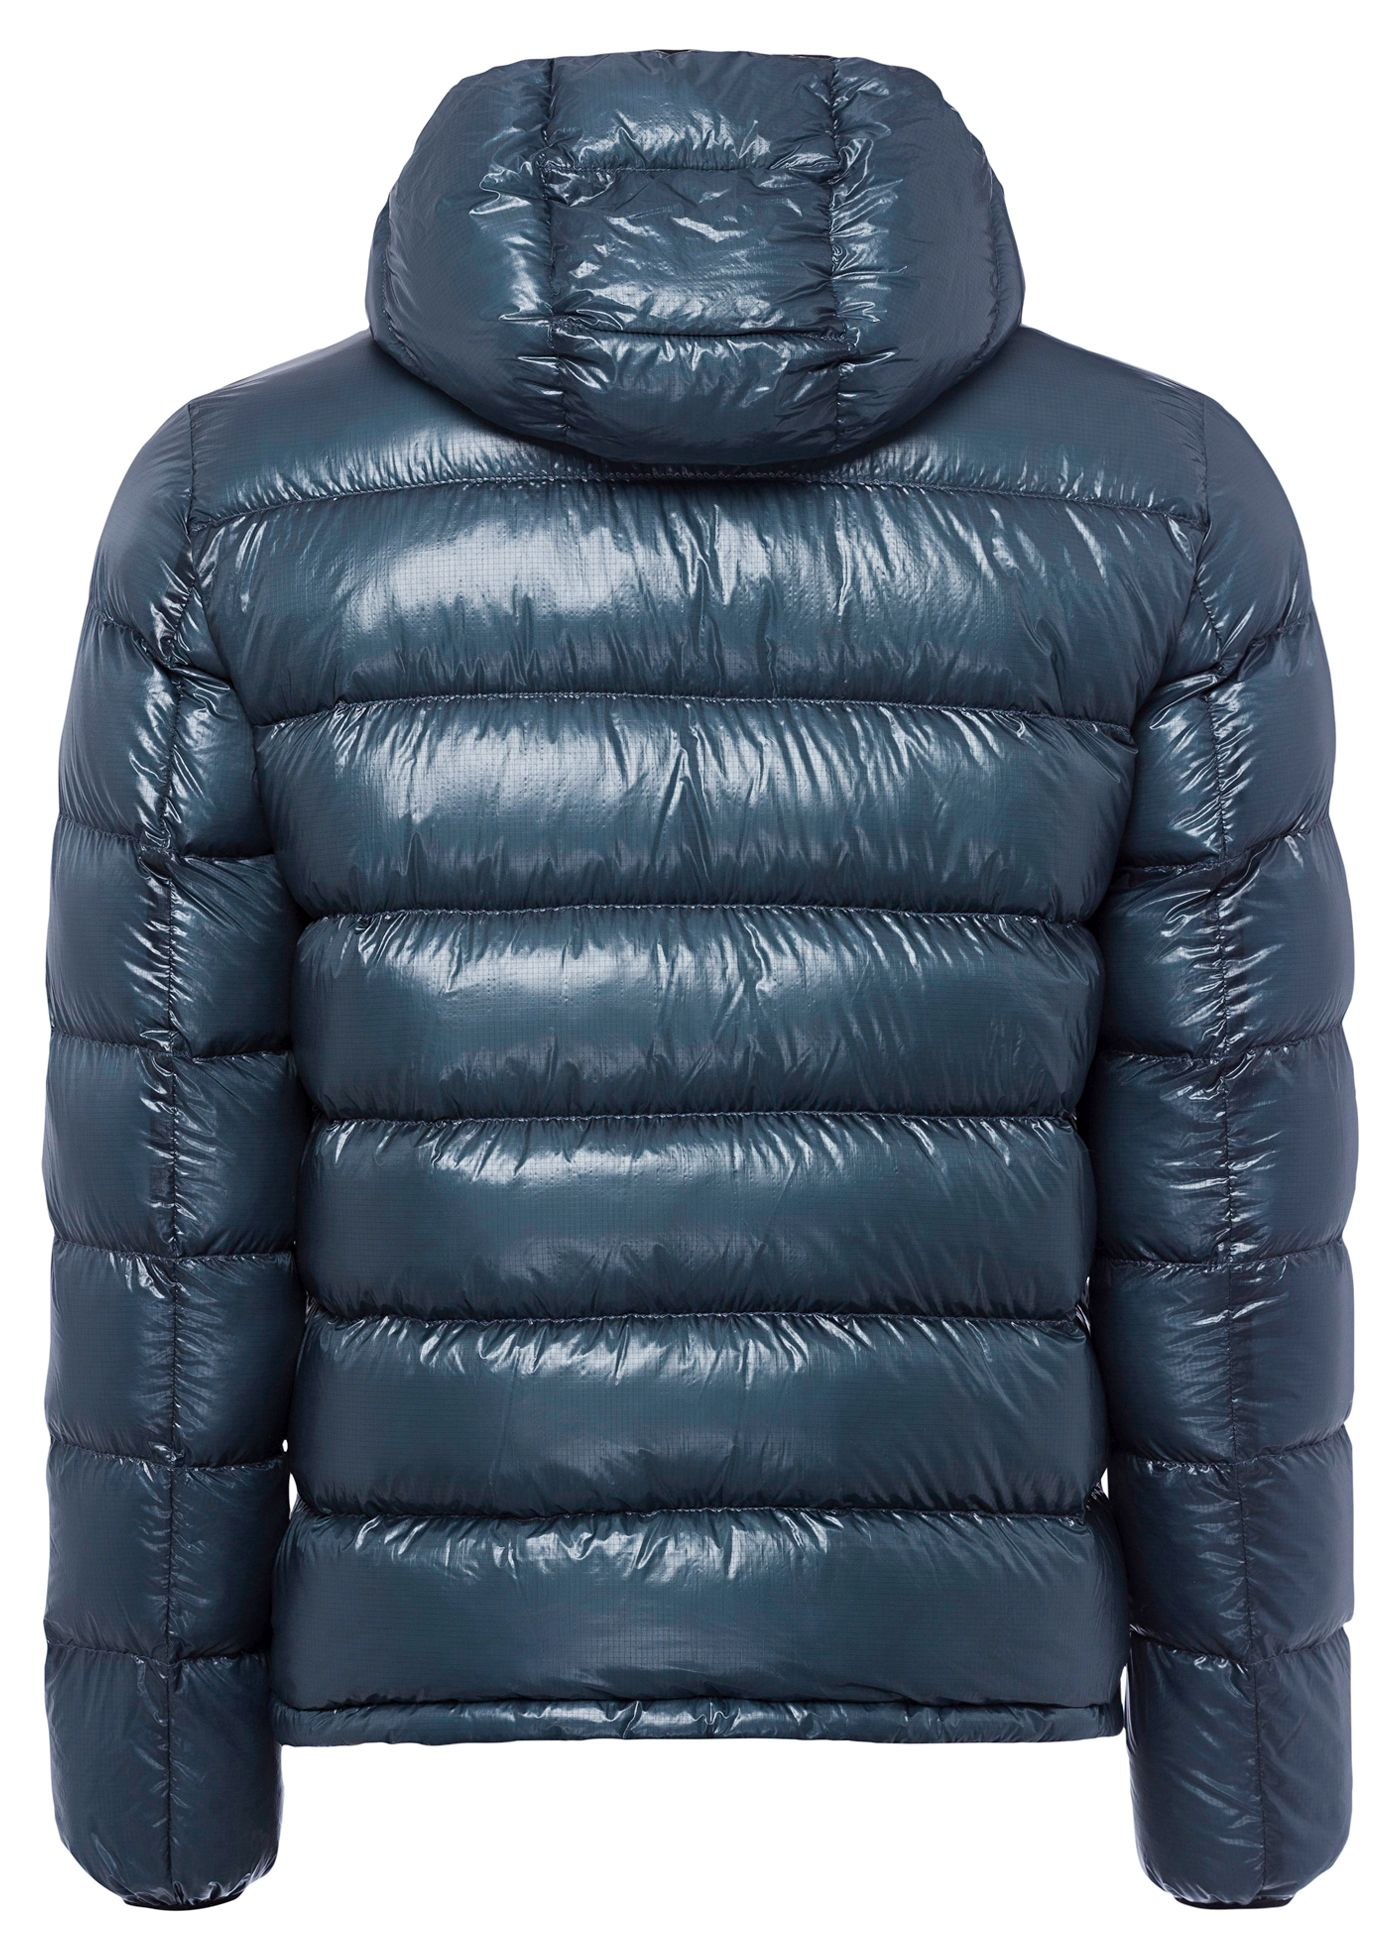 Men's Woven Jacket image number 1